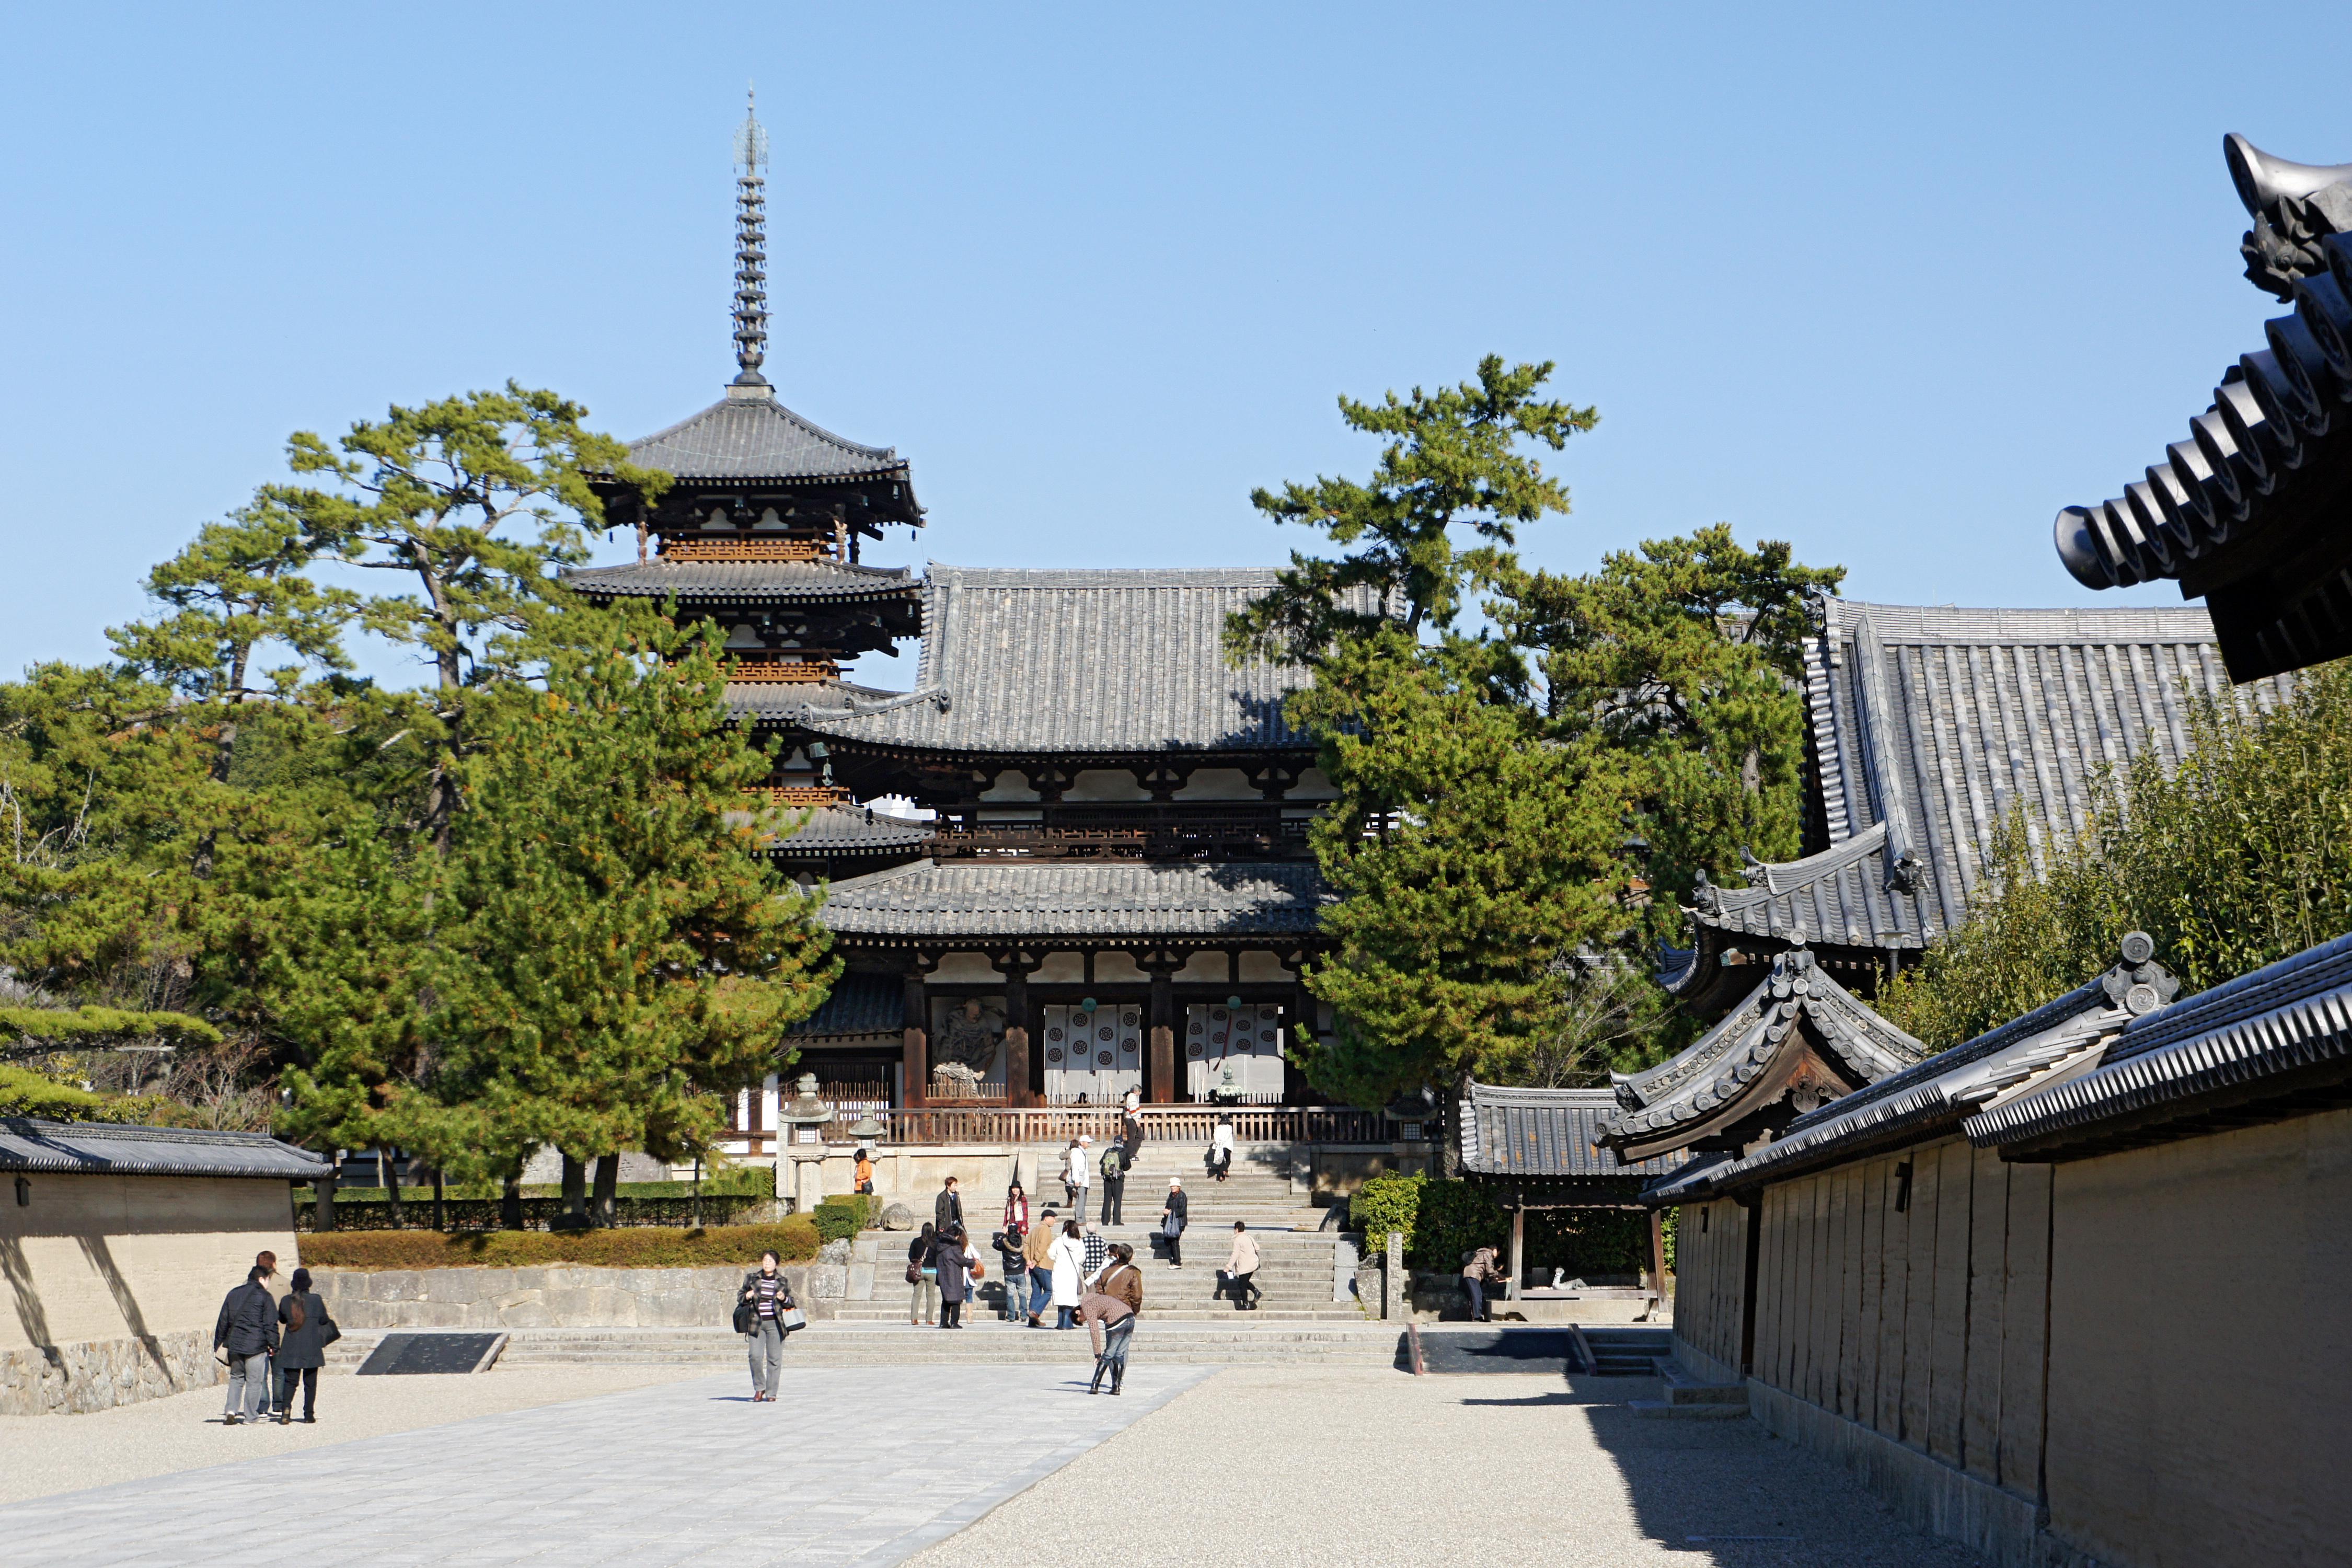 http://upload.wikimedia.org/wikipedia/commons/e/e4/Horyu-ji45s2s4500.jpg